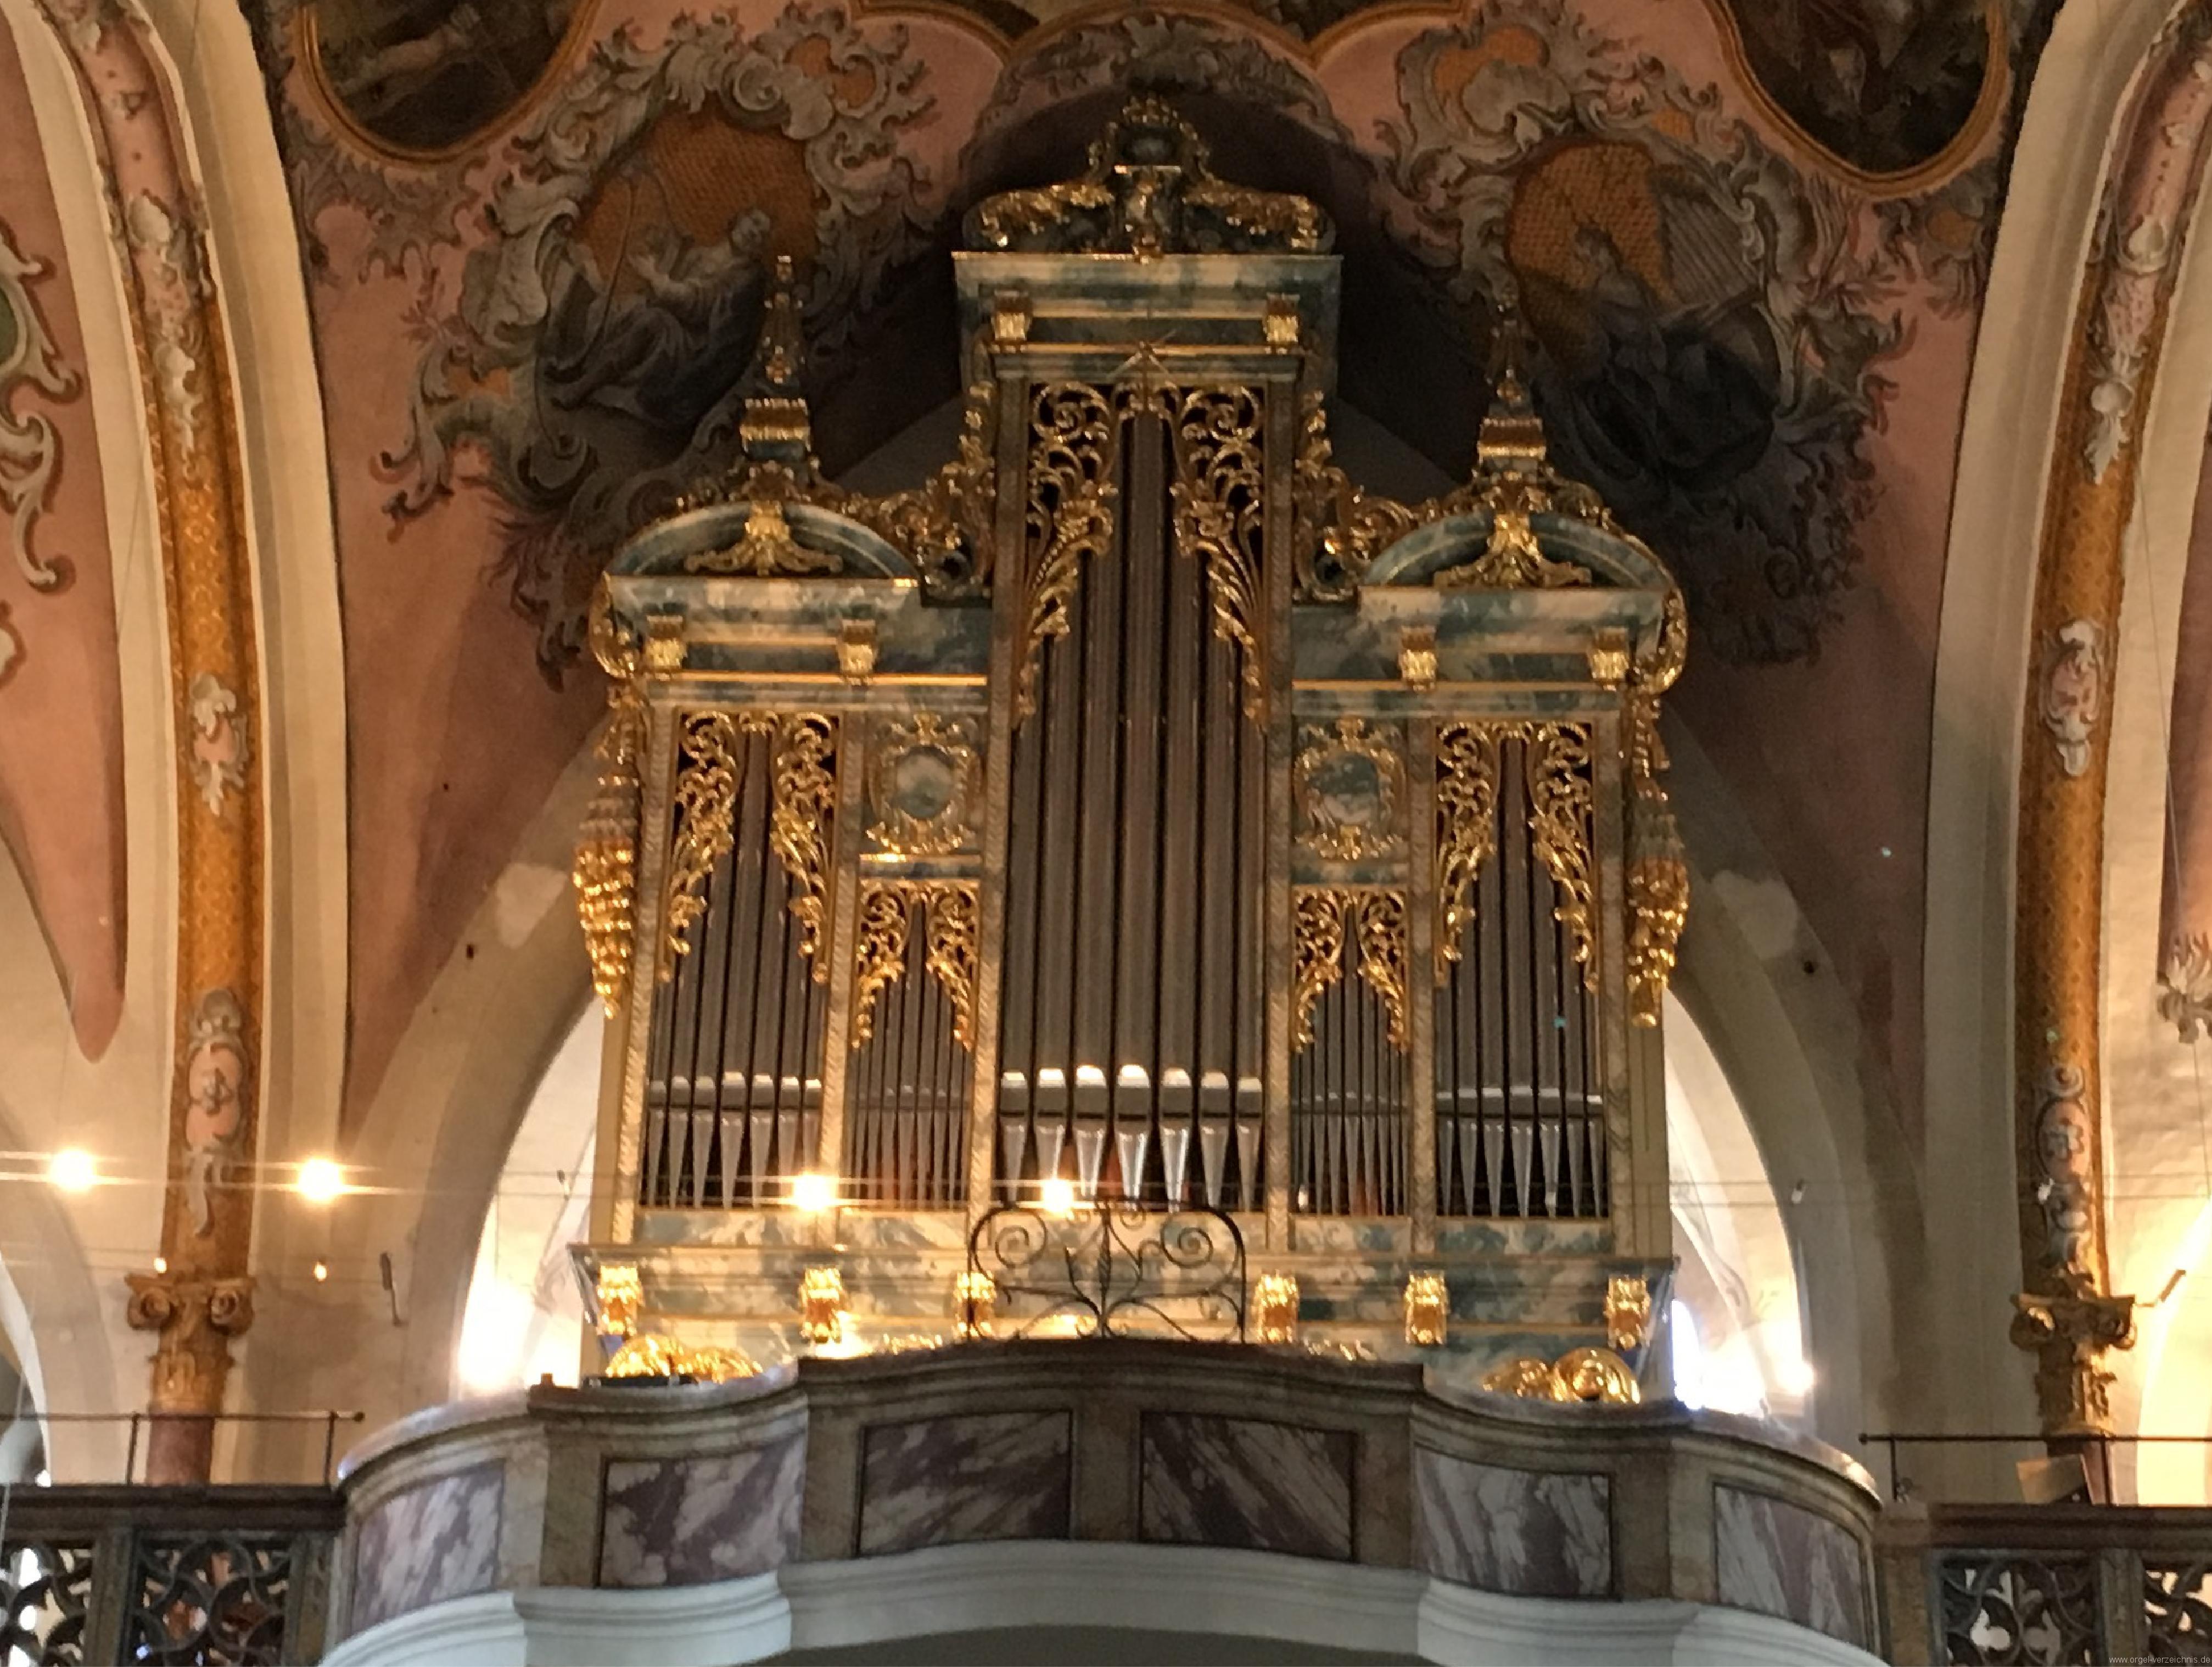 hall-in-tirol-stradtpfarrkirche-st-nikolaus-37-orgel